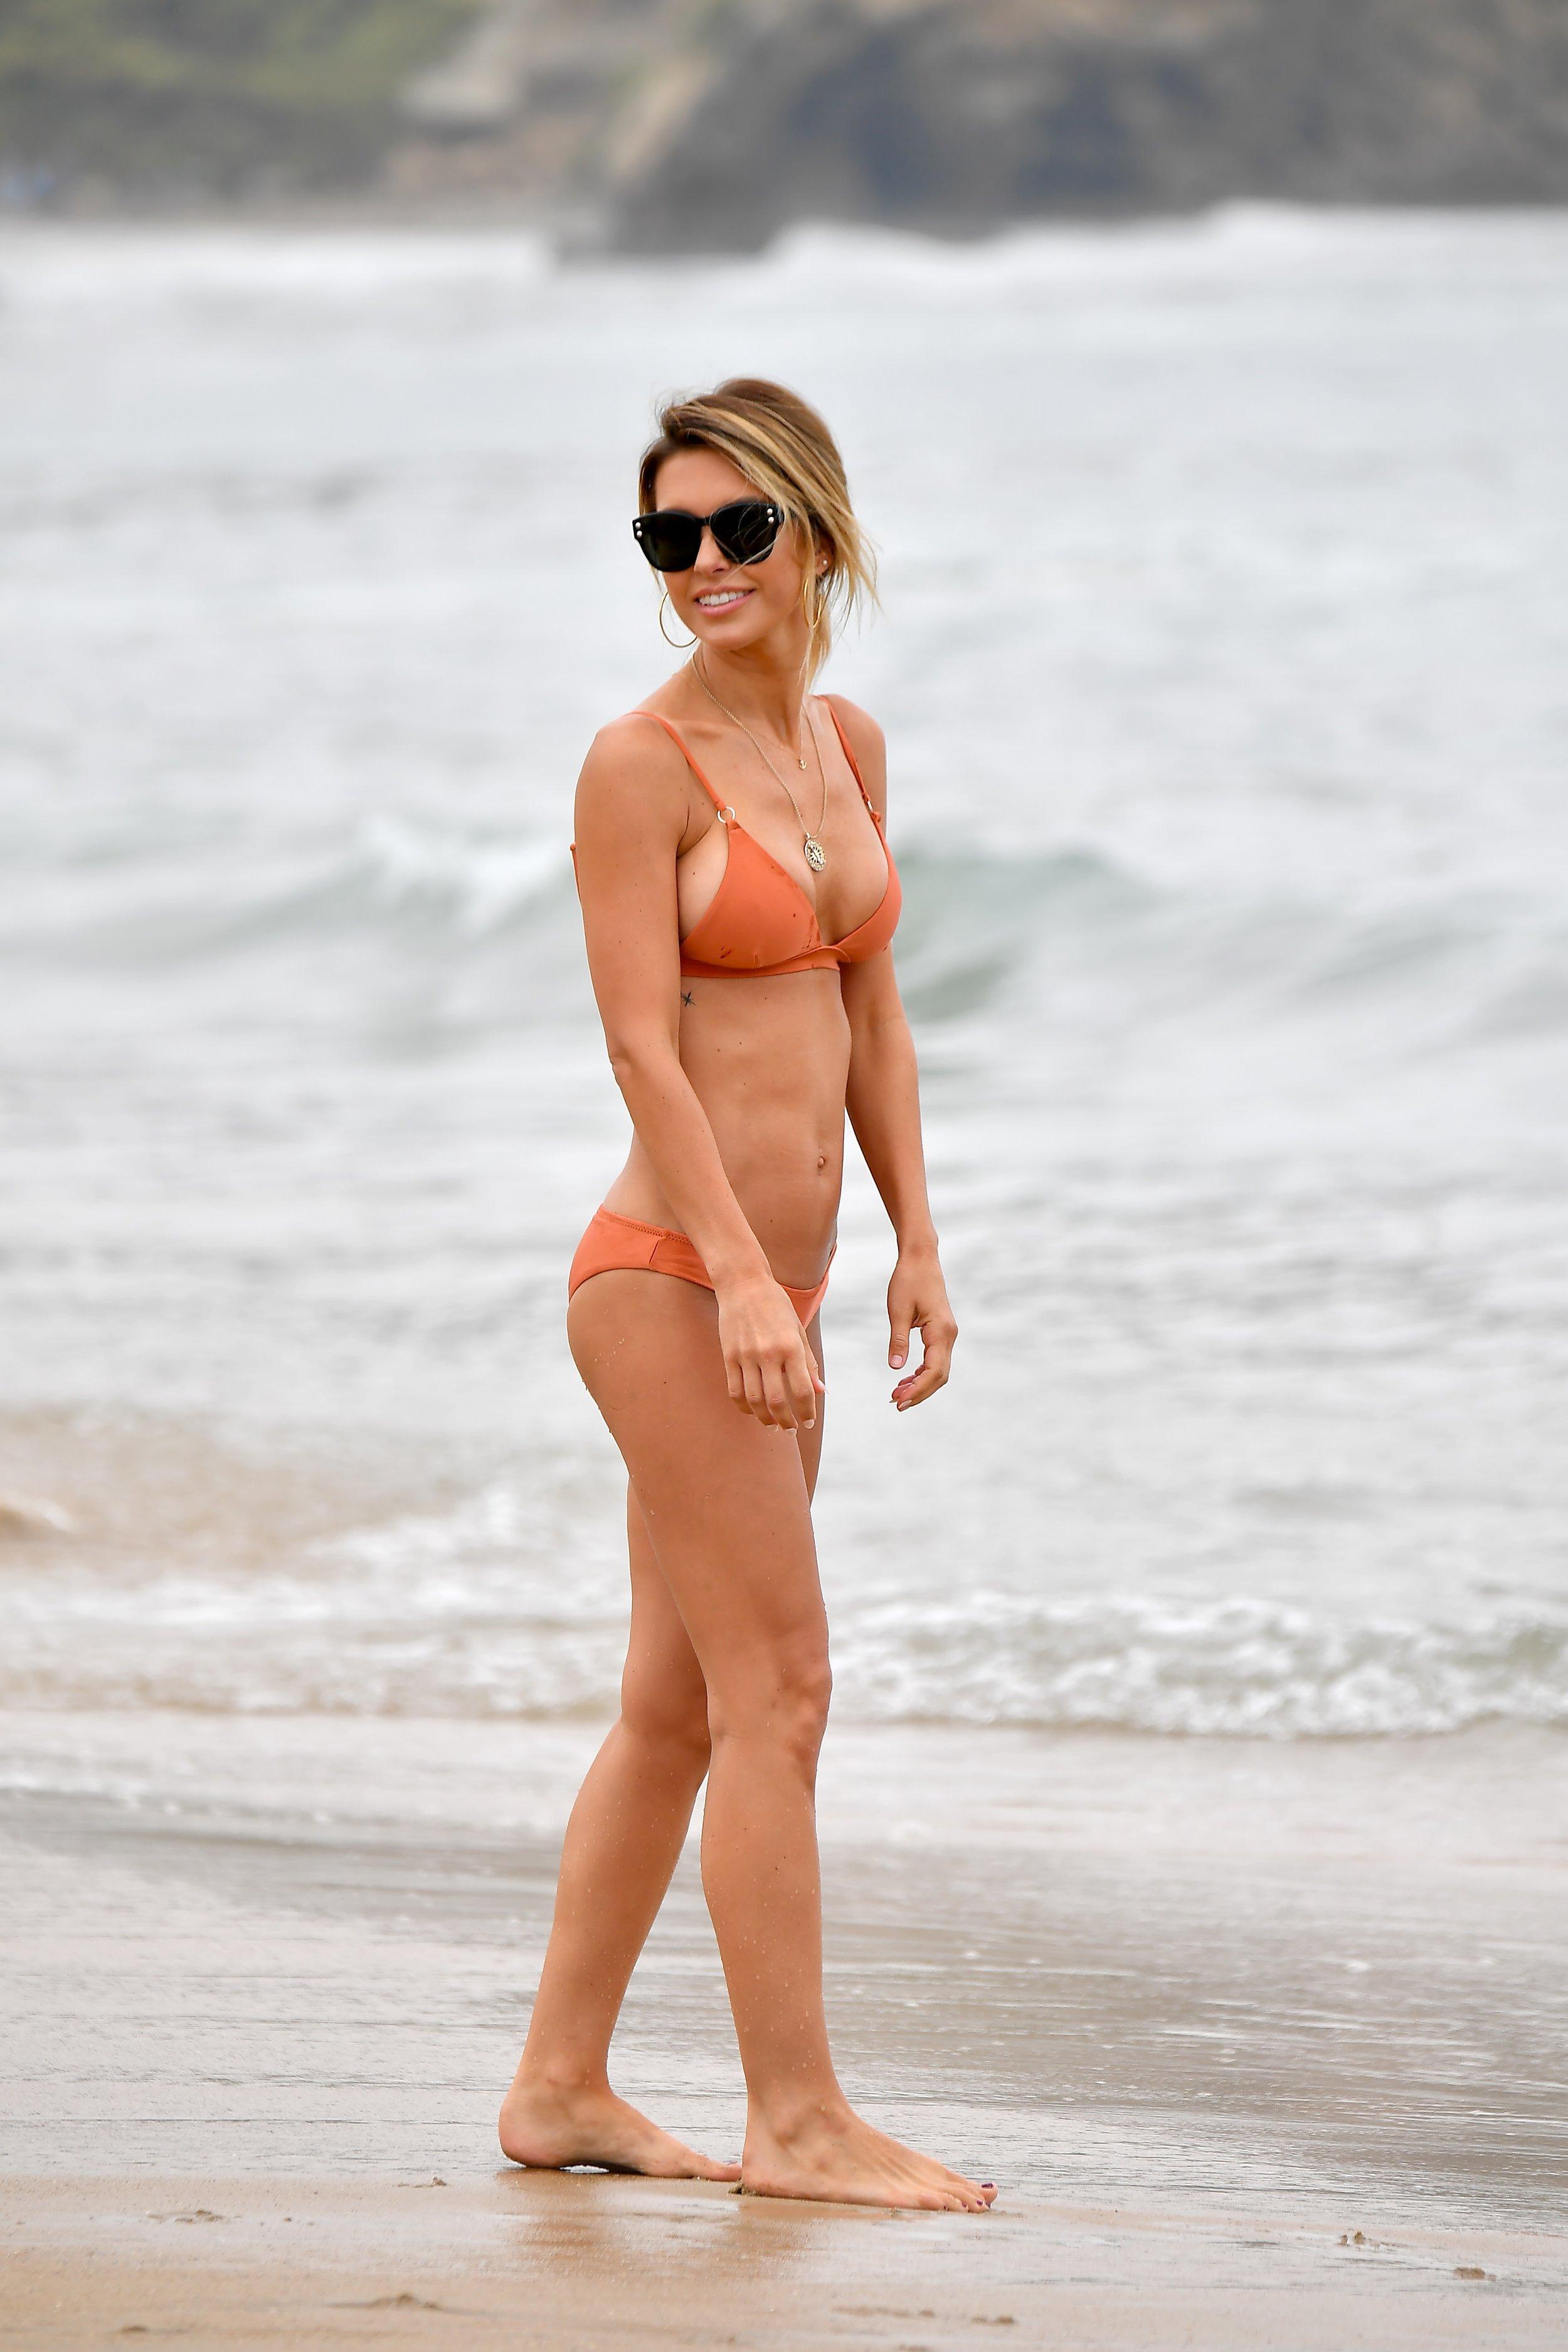 Audrina Patridge on the Beach in Santa Monica (07_15_19)